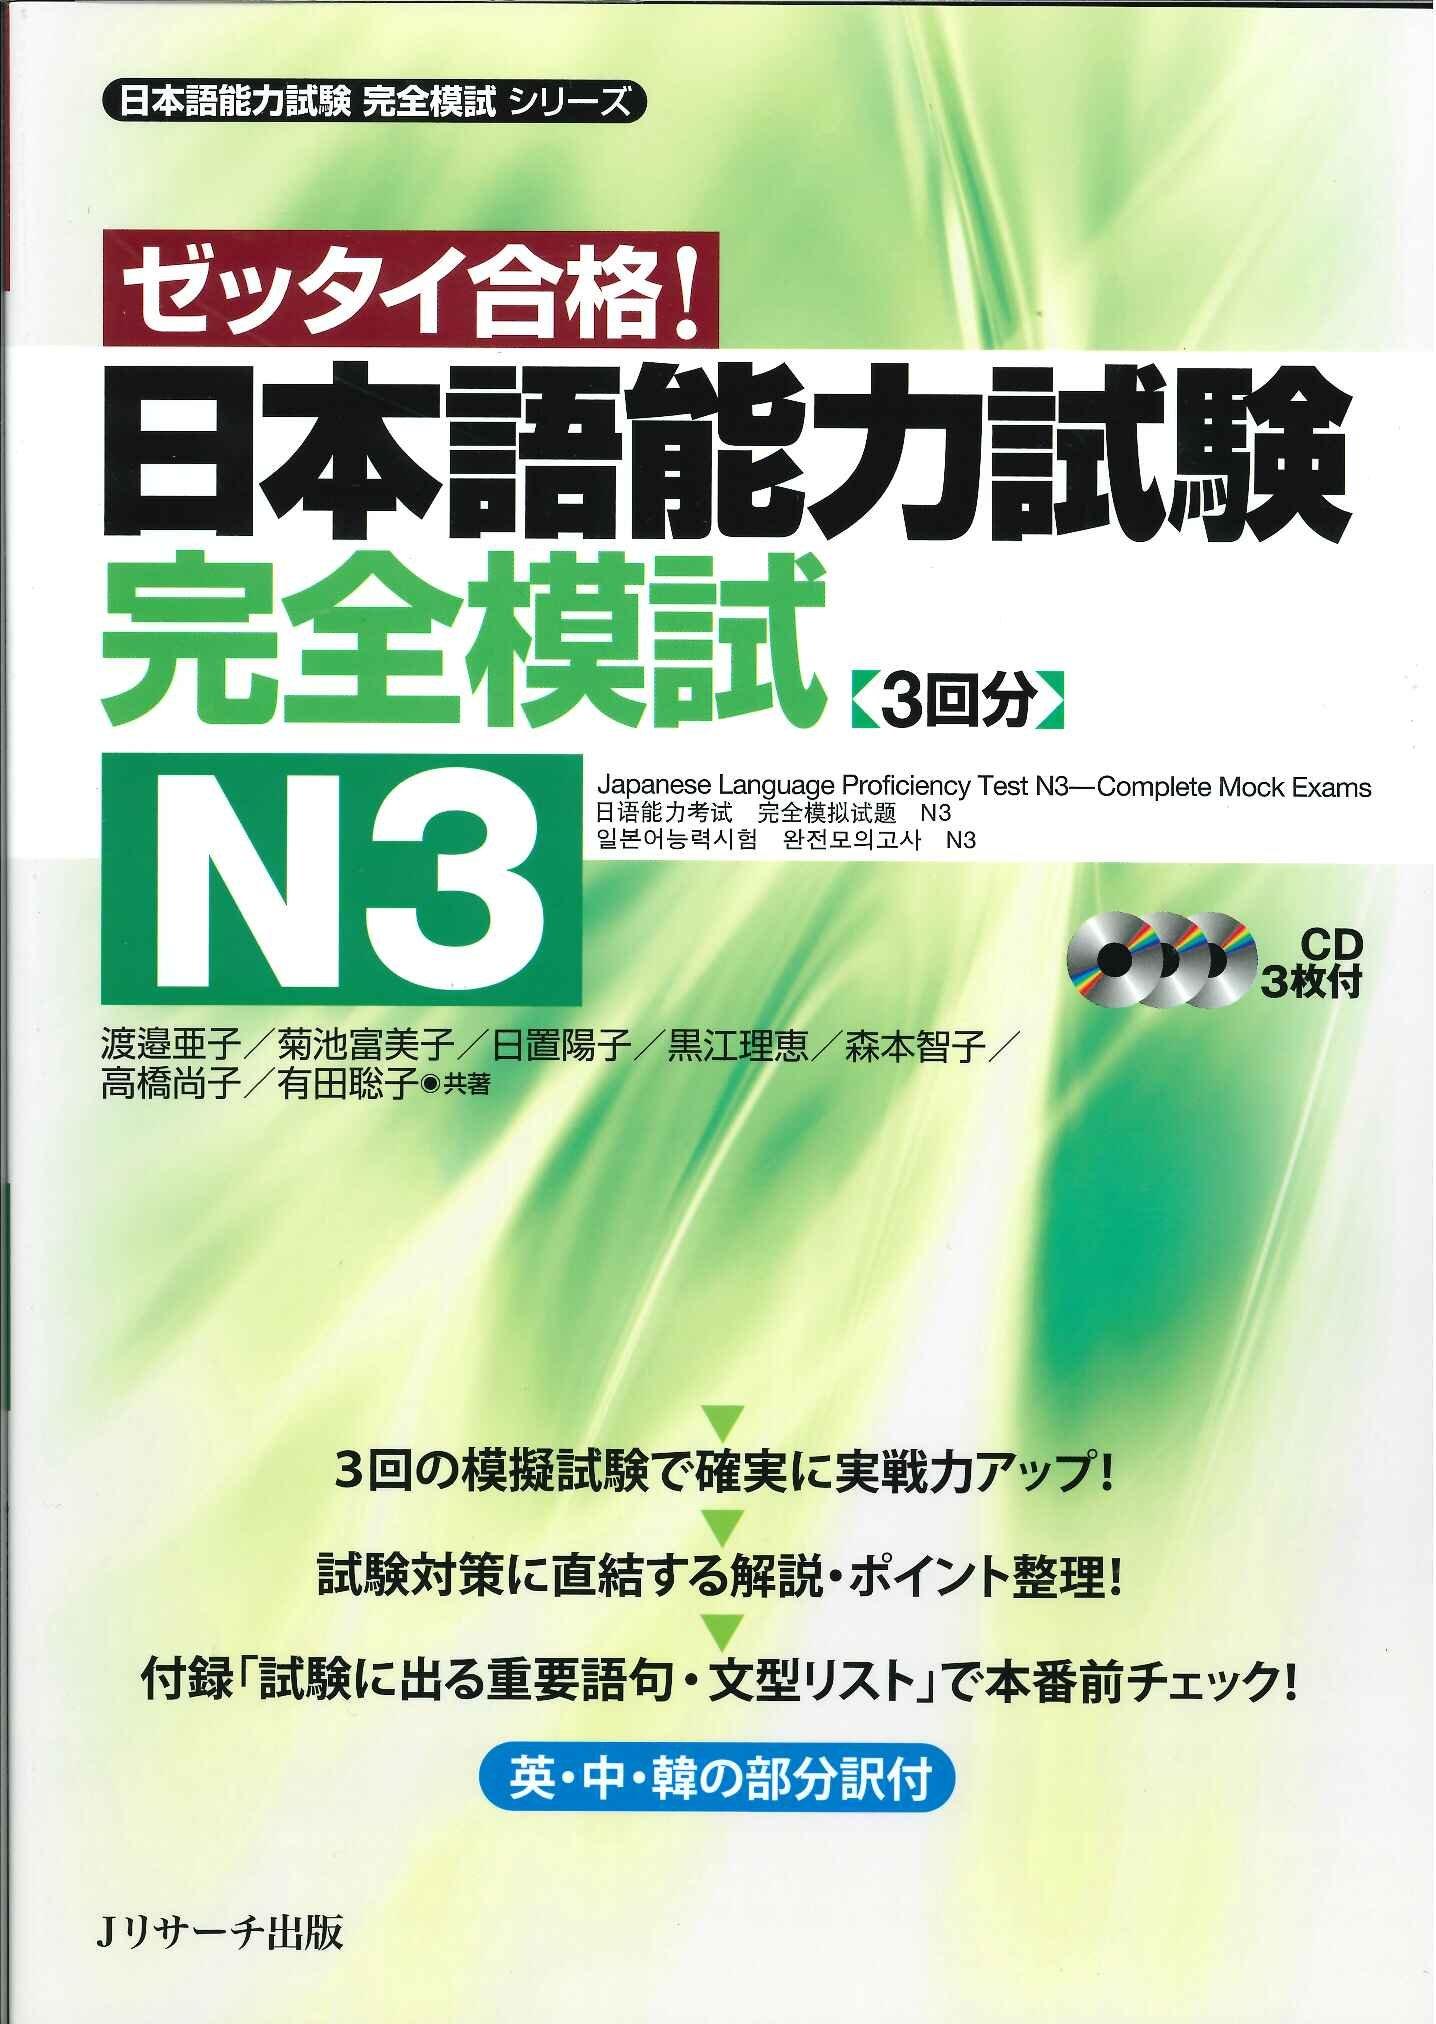 Download JLPT Kanzen Moshi N3 w/CDs [Japanese Language Proficiency Test-Complete Mock Exams Series] (Japanese Language Proficiency Test-Complete Mock Exams Series) pdf epub